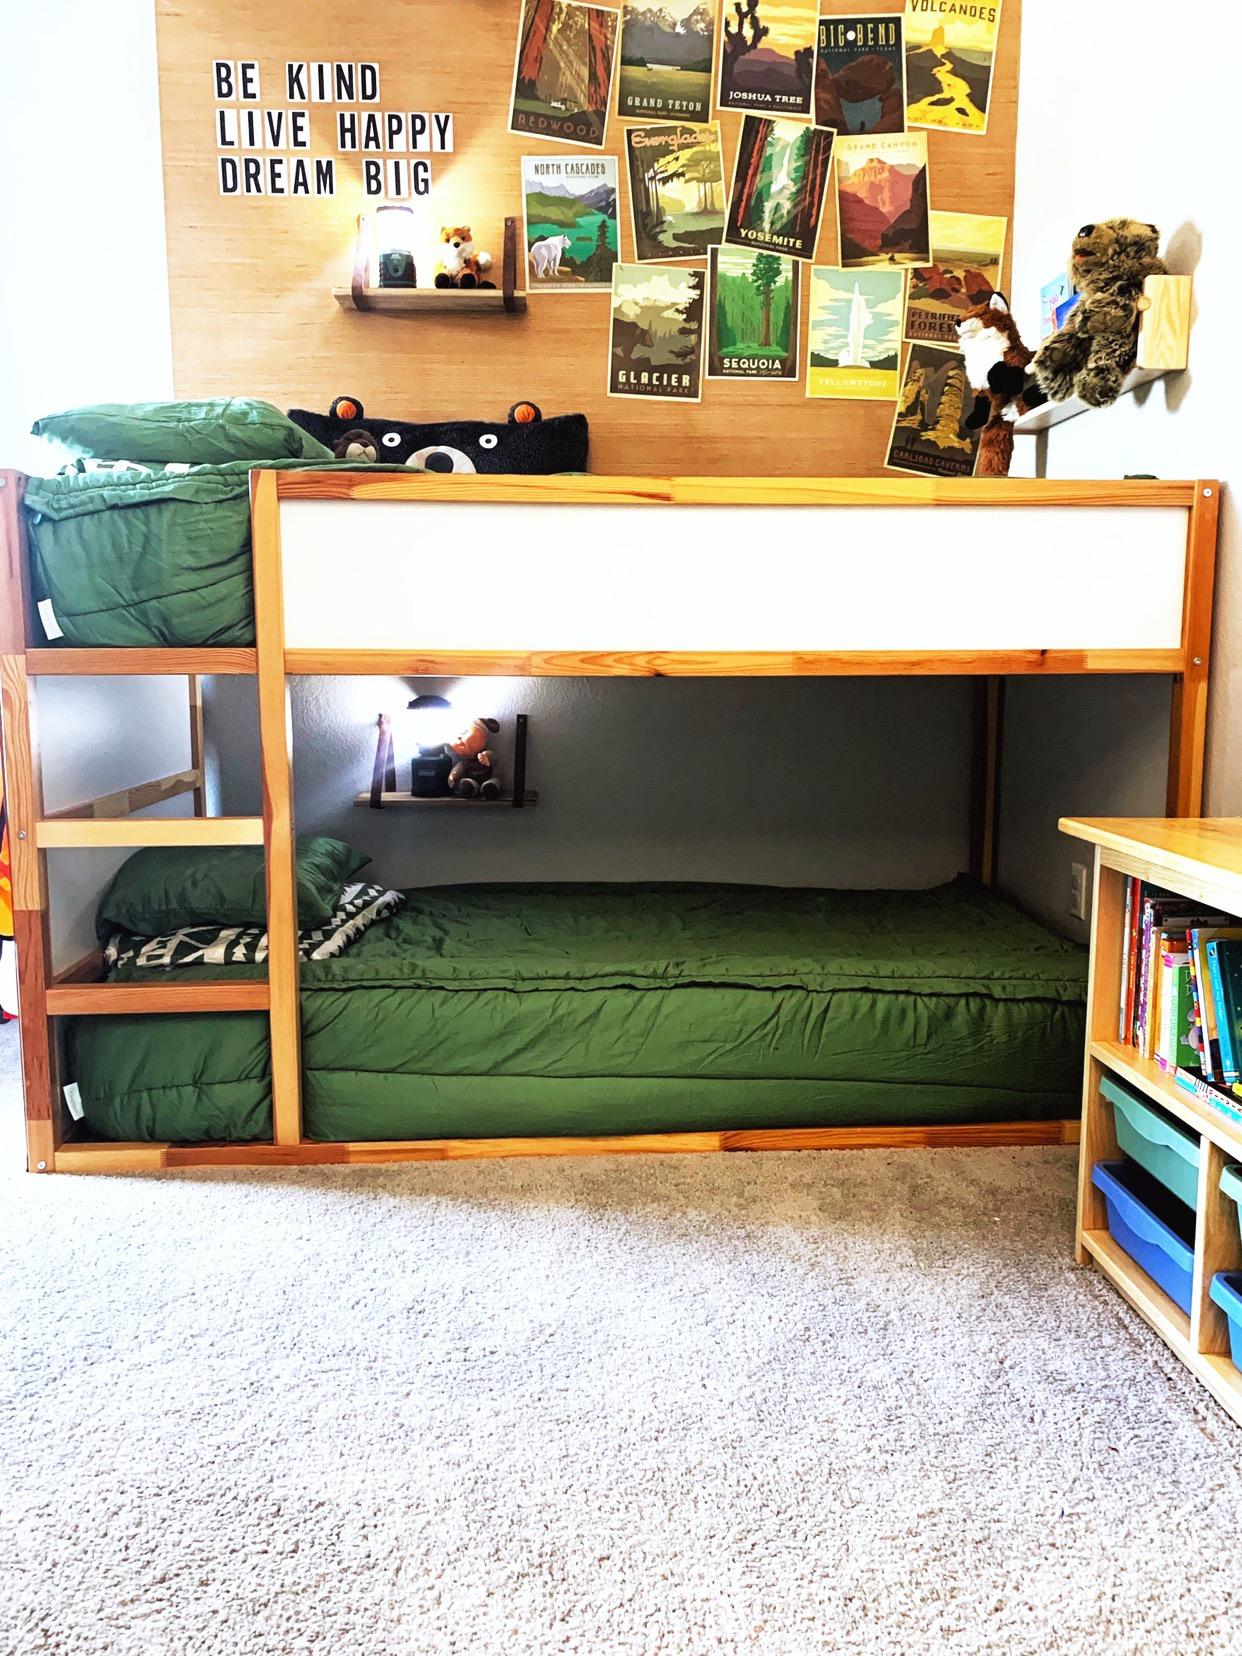 Full Size of Ikea Kura Hack House Bed Montessori Storage Floor Hacks Pinterest Slide Ideas Bunk With Pegboard Jill Krause Wohnzimmer Kura Hack